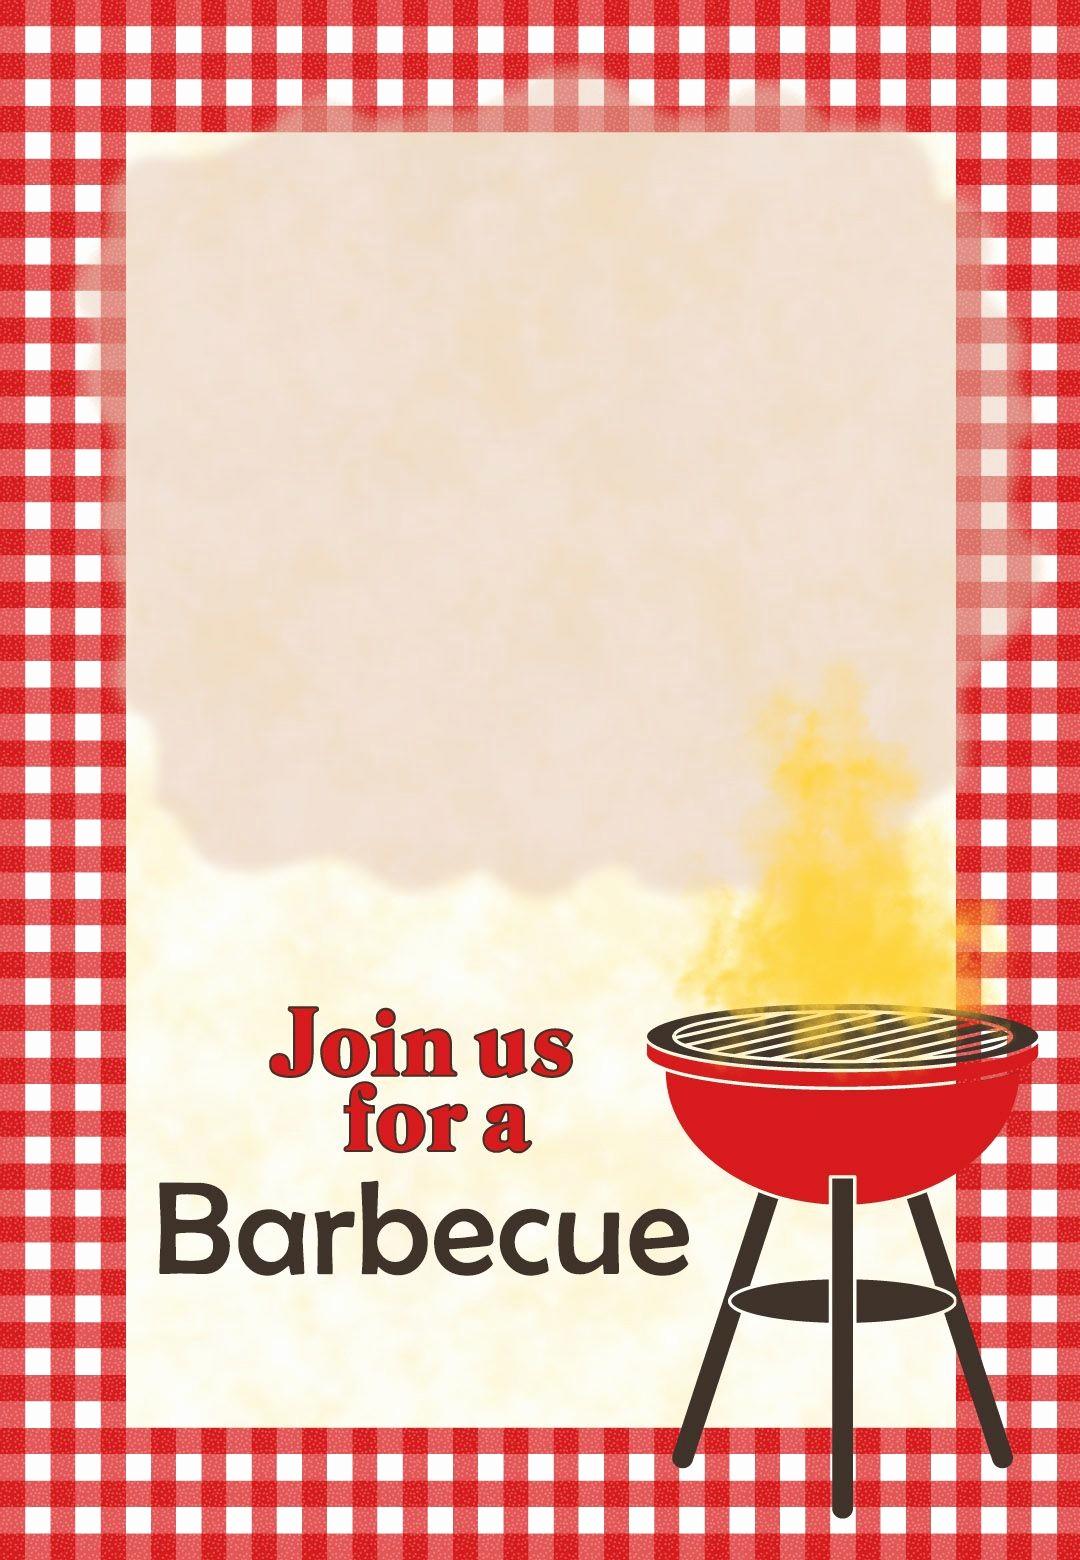 Free Downloadable Bbq Invitation Template Fresh A Barbecue Free Printable Party Invitation Template